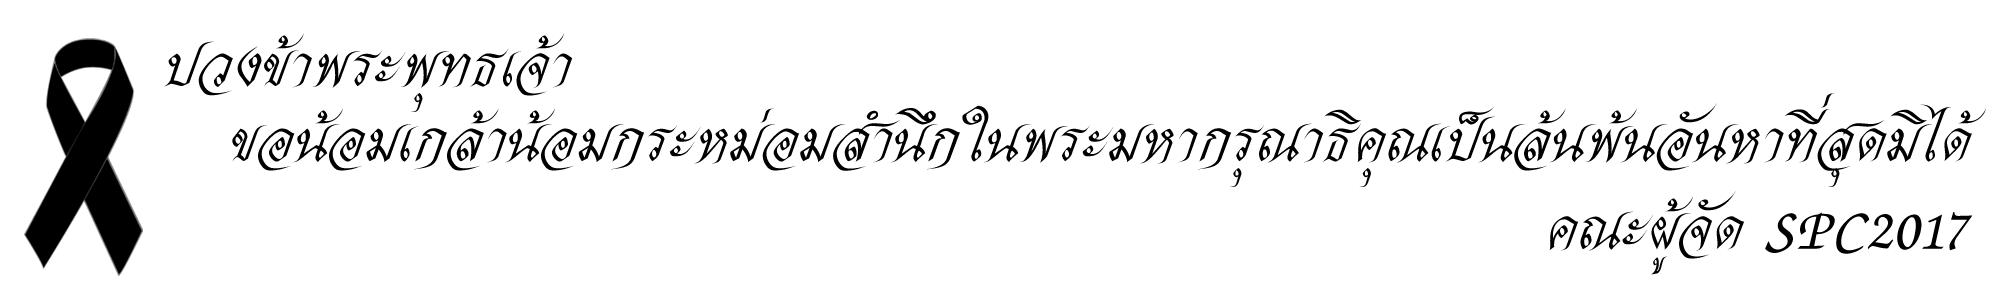 malee thai massage escort stockhol